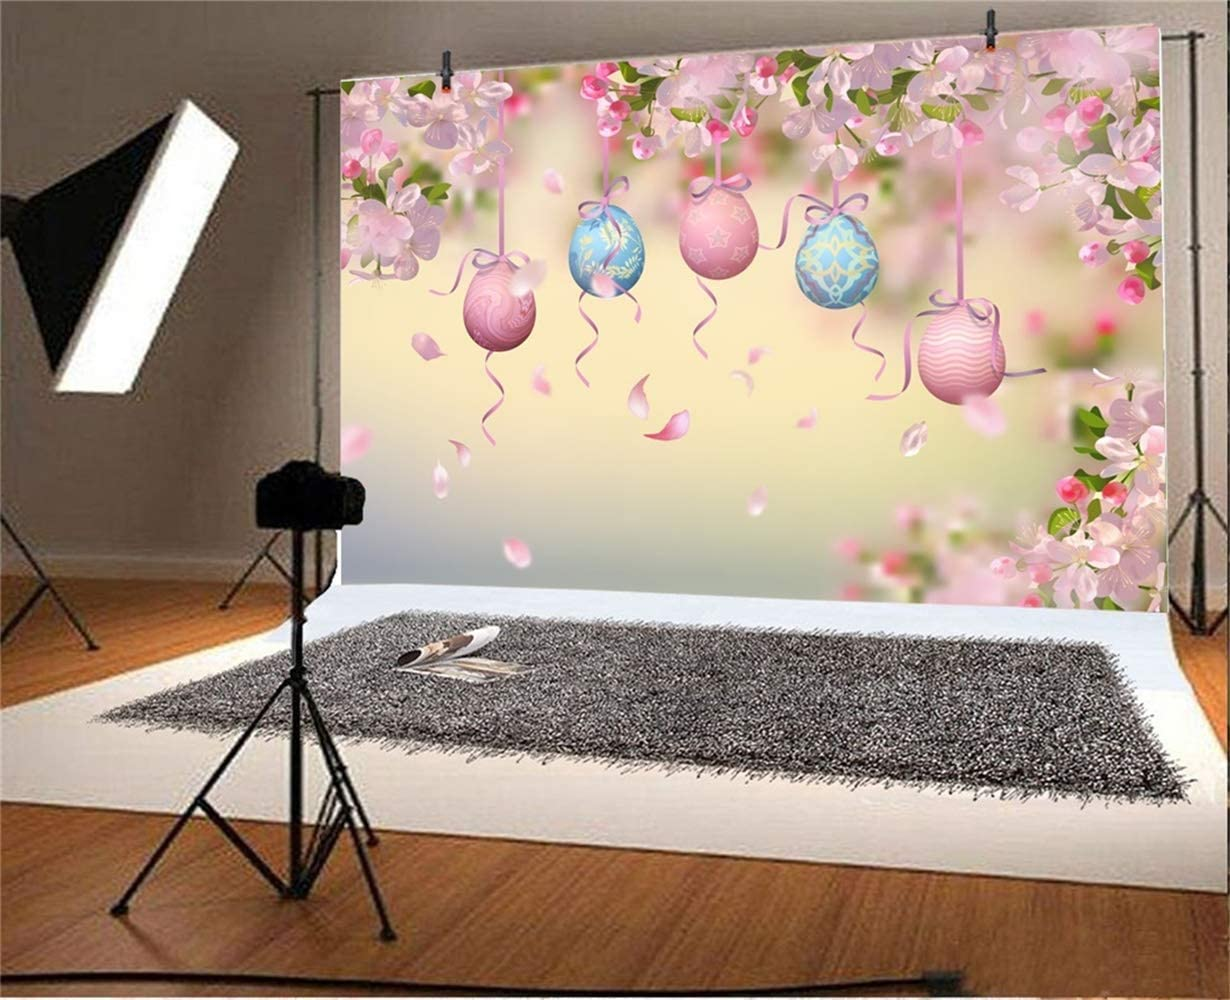 GoHeBe 10x7ft Vinyl Easter Photography Background Hanging Easter Eggs Spring Pink Peach Blossom Falling Petals Backdrop Child Kids Baby Girl Portrait Greeting Card Easter Egg Hunt Wallpaper